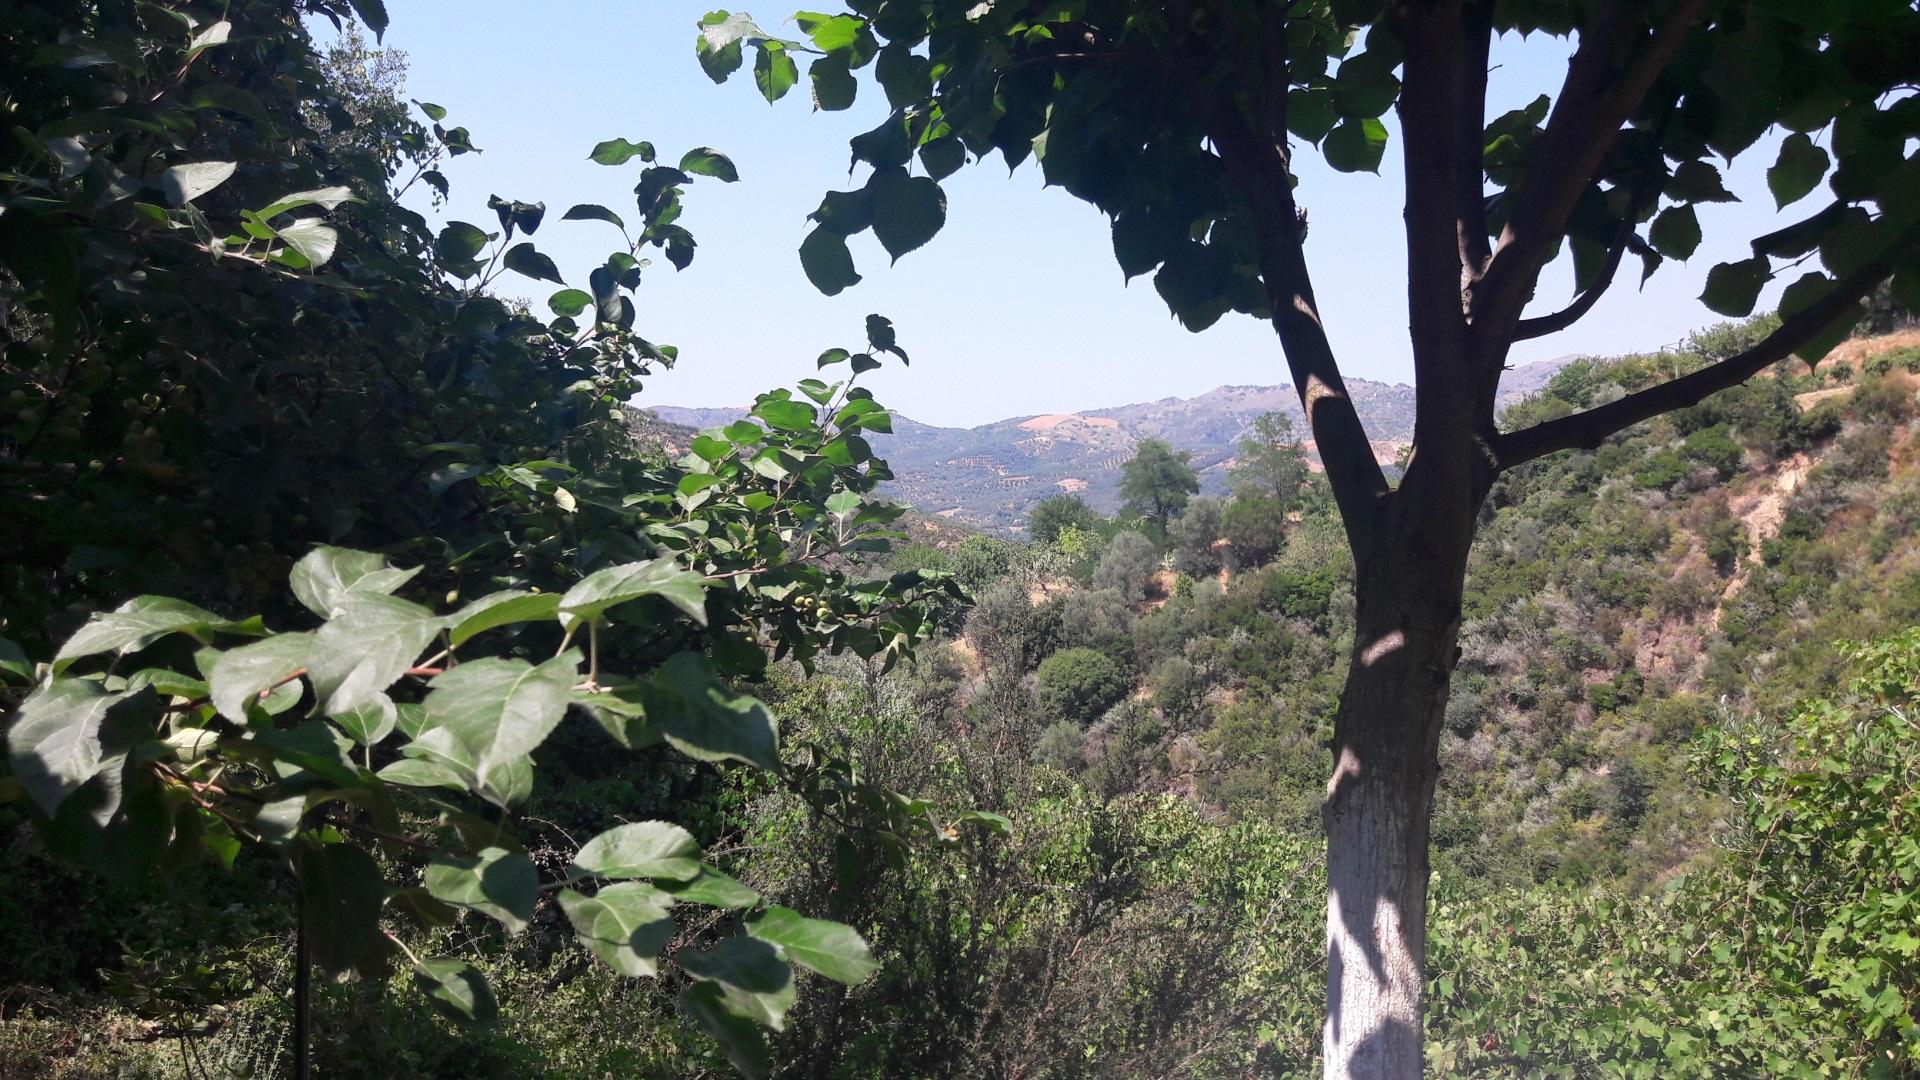 Visiter Chania - Crète